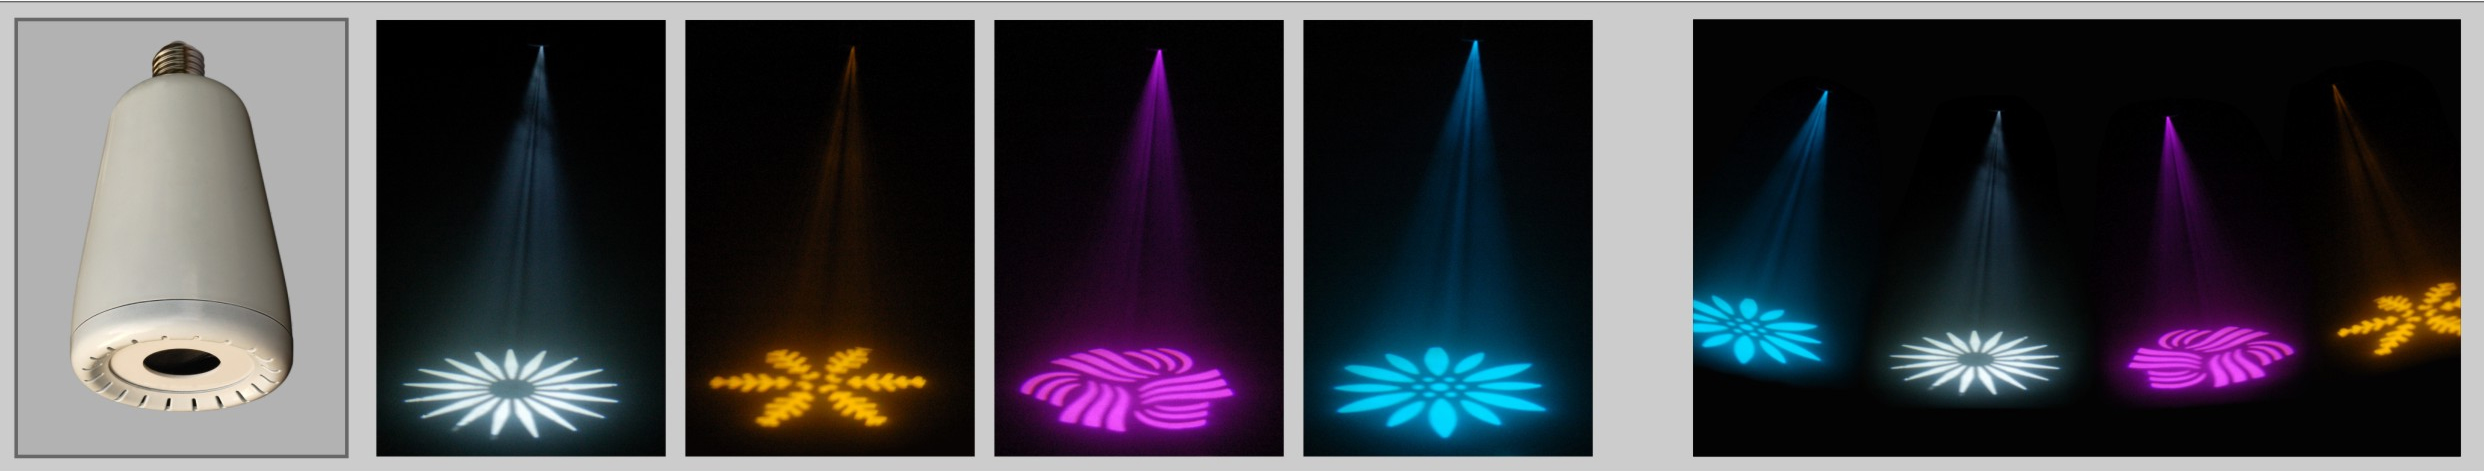 fotismos_led_flower_pattern_gia_nyxterina_kentra_club_bar